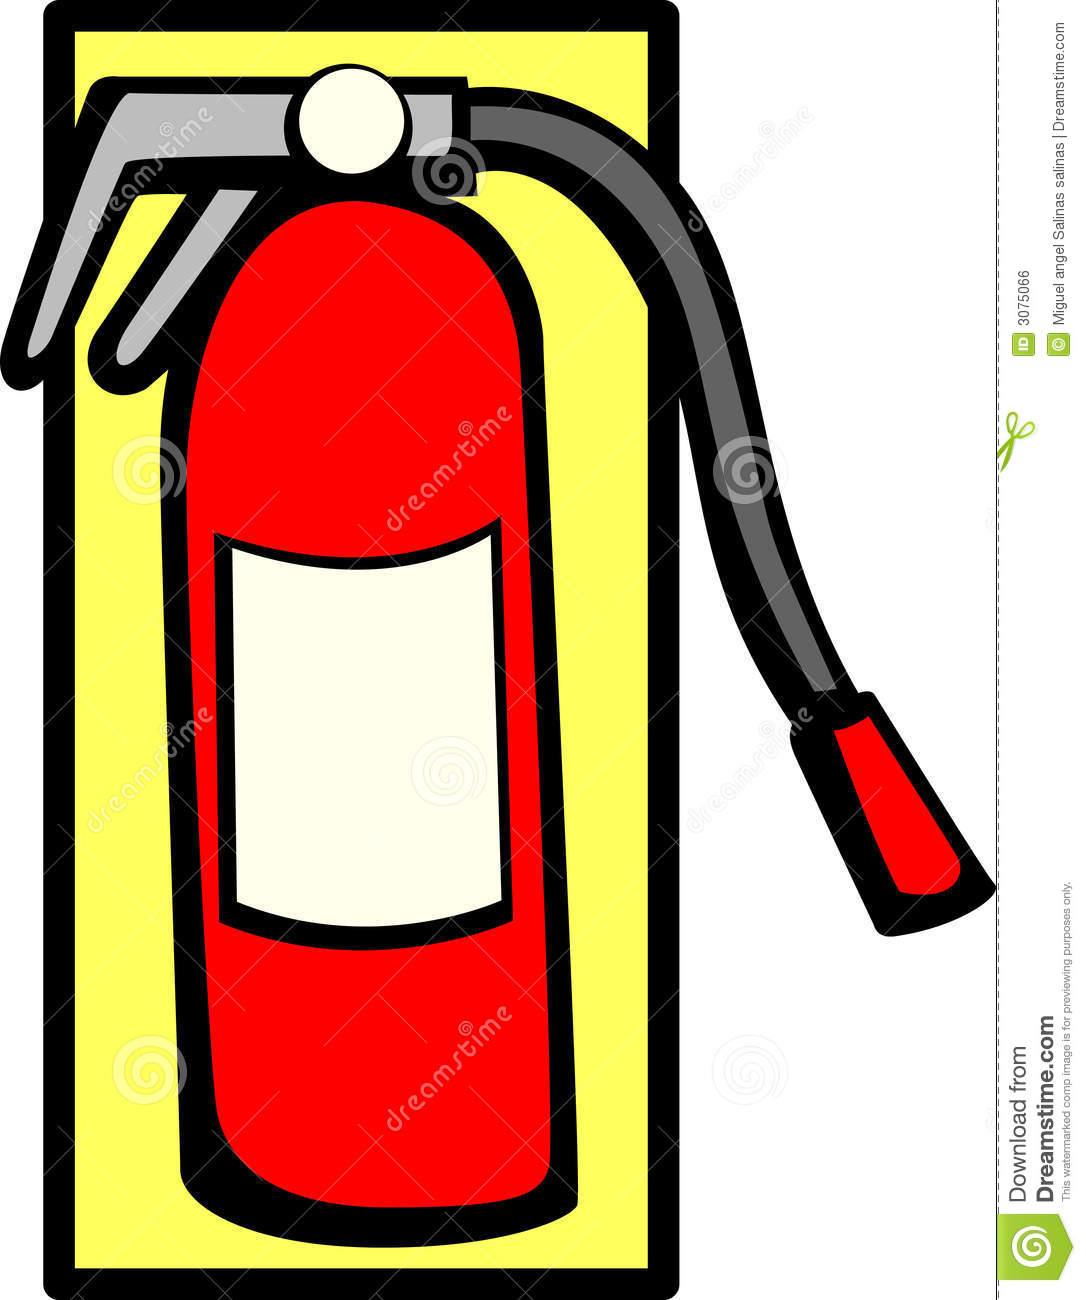 Cute Fire Extinguisher Clipart | Clipart Panda - Free ...